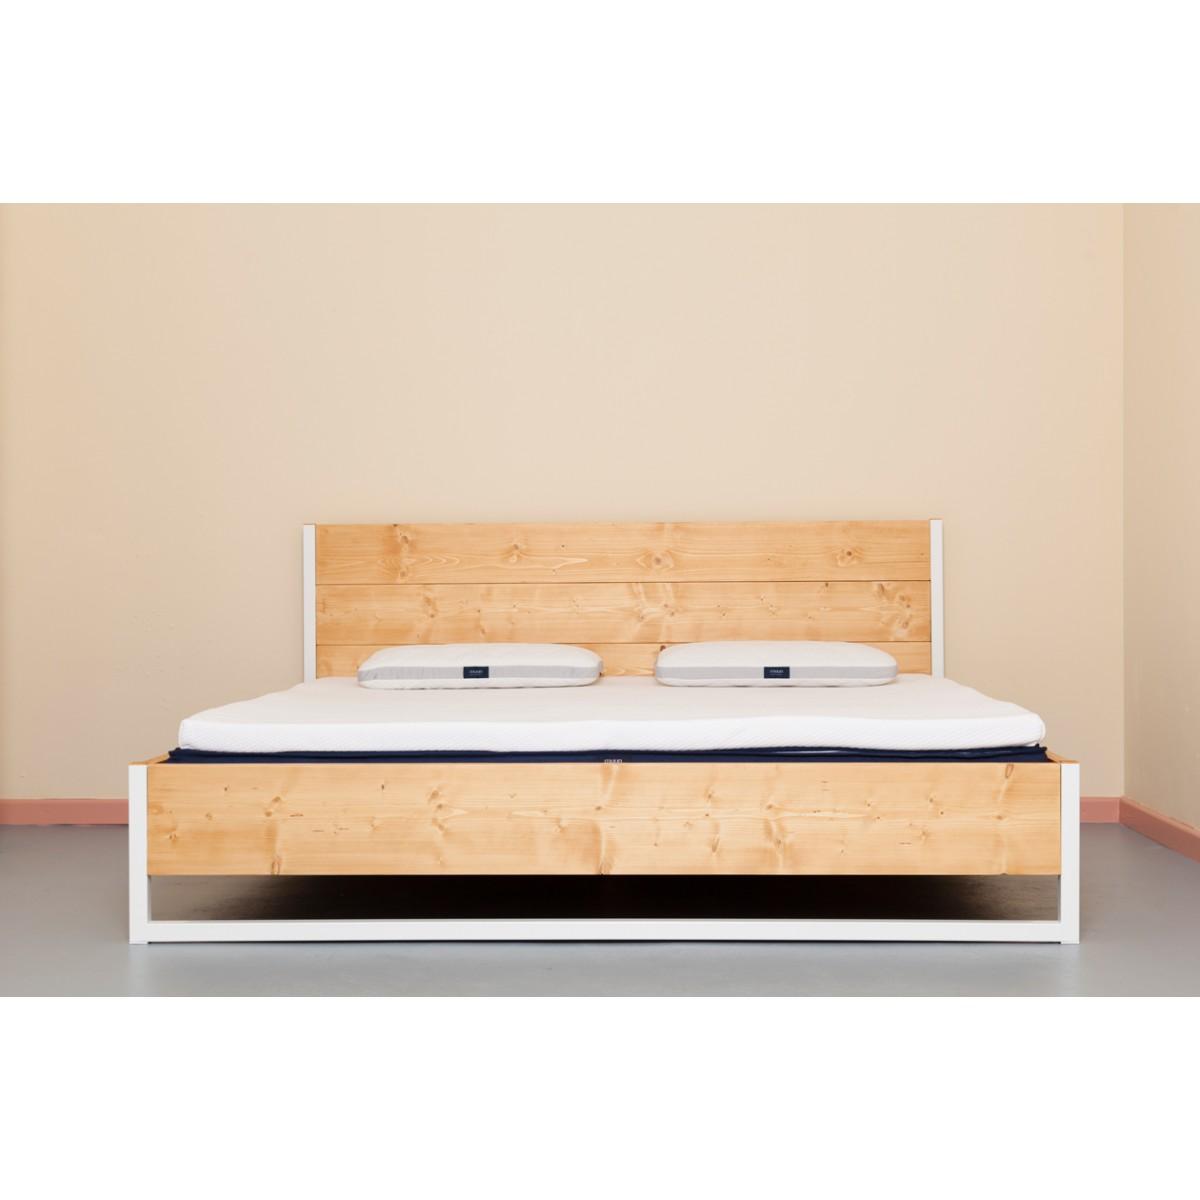 Upcycling Industrial Bett aus recyceltem Vollholz und Baustahl | LUBERON NATUR